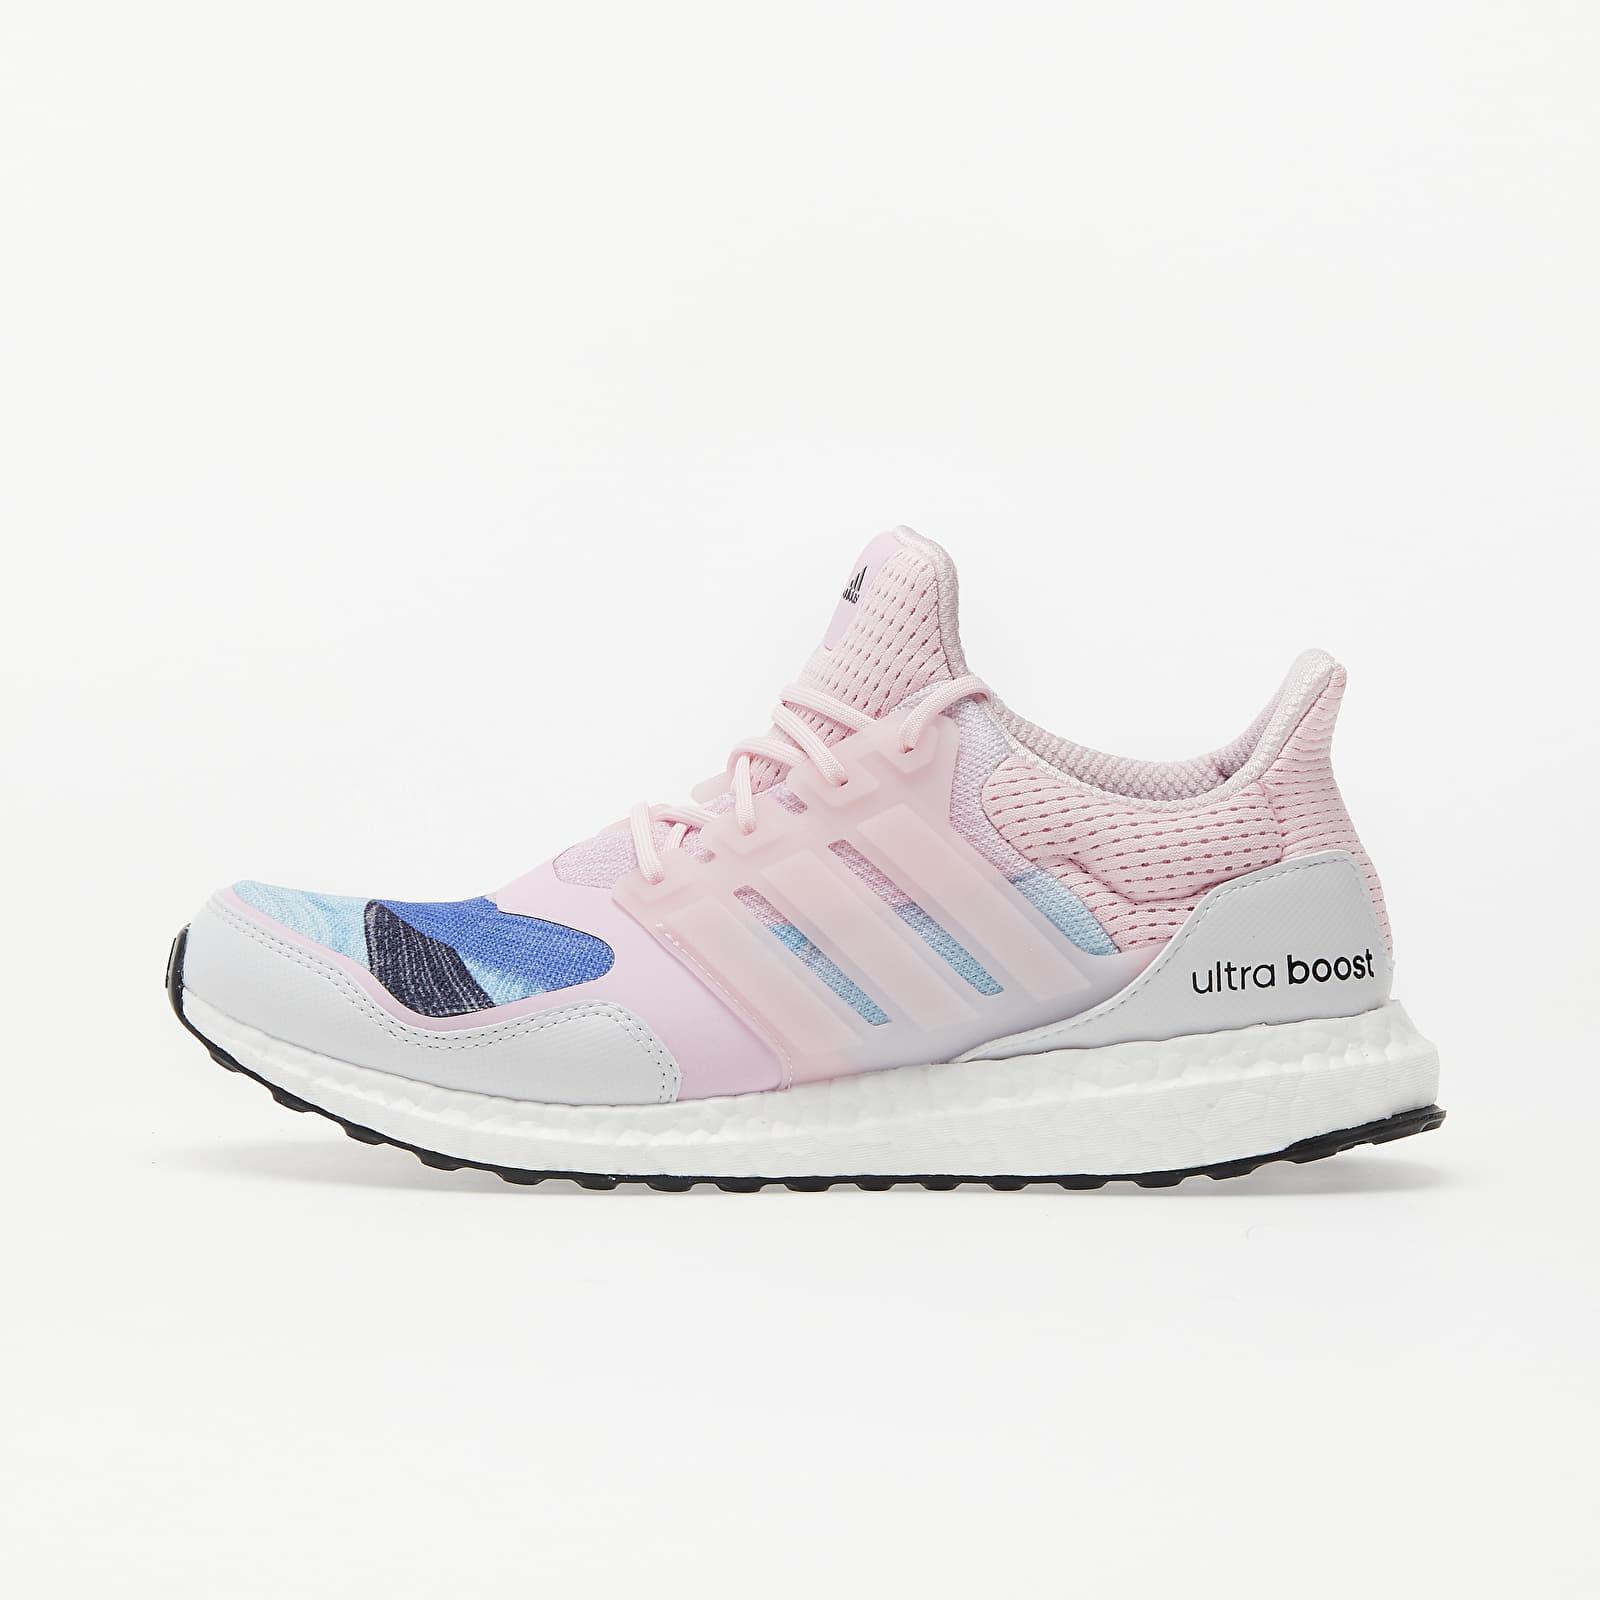 Dámske topánky a tenisky adidas UltraBOOST S&L DNA W Clear Pink/ Clear Pink/ Hazy Blue